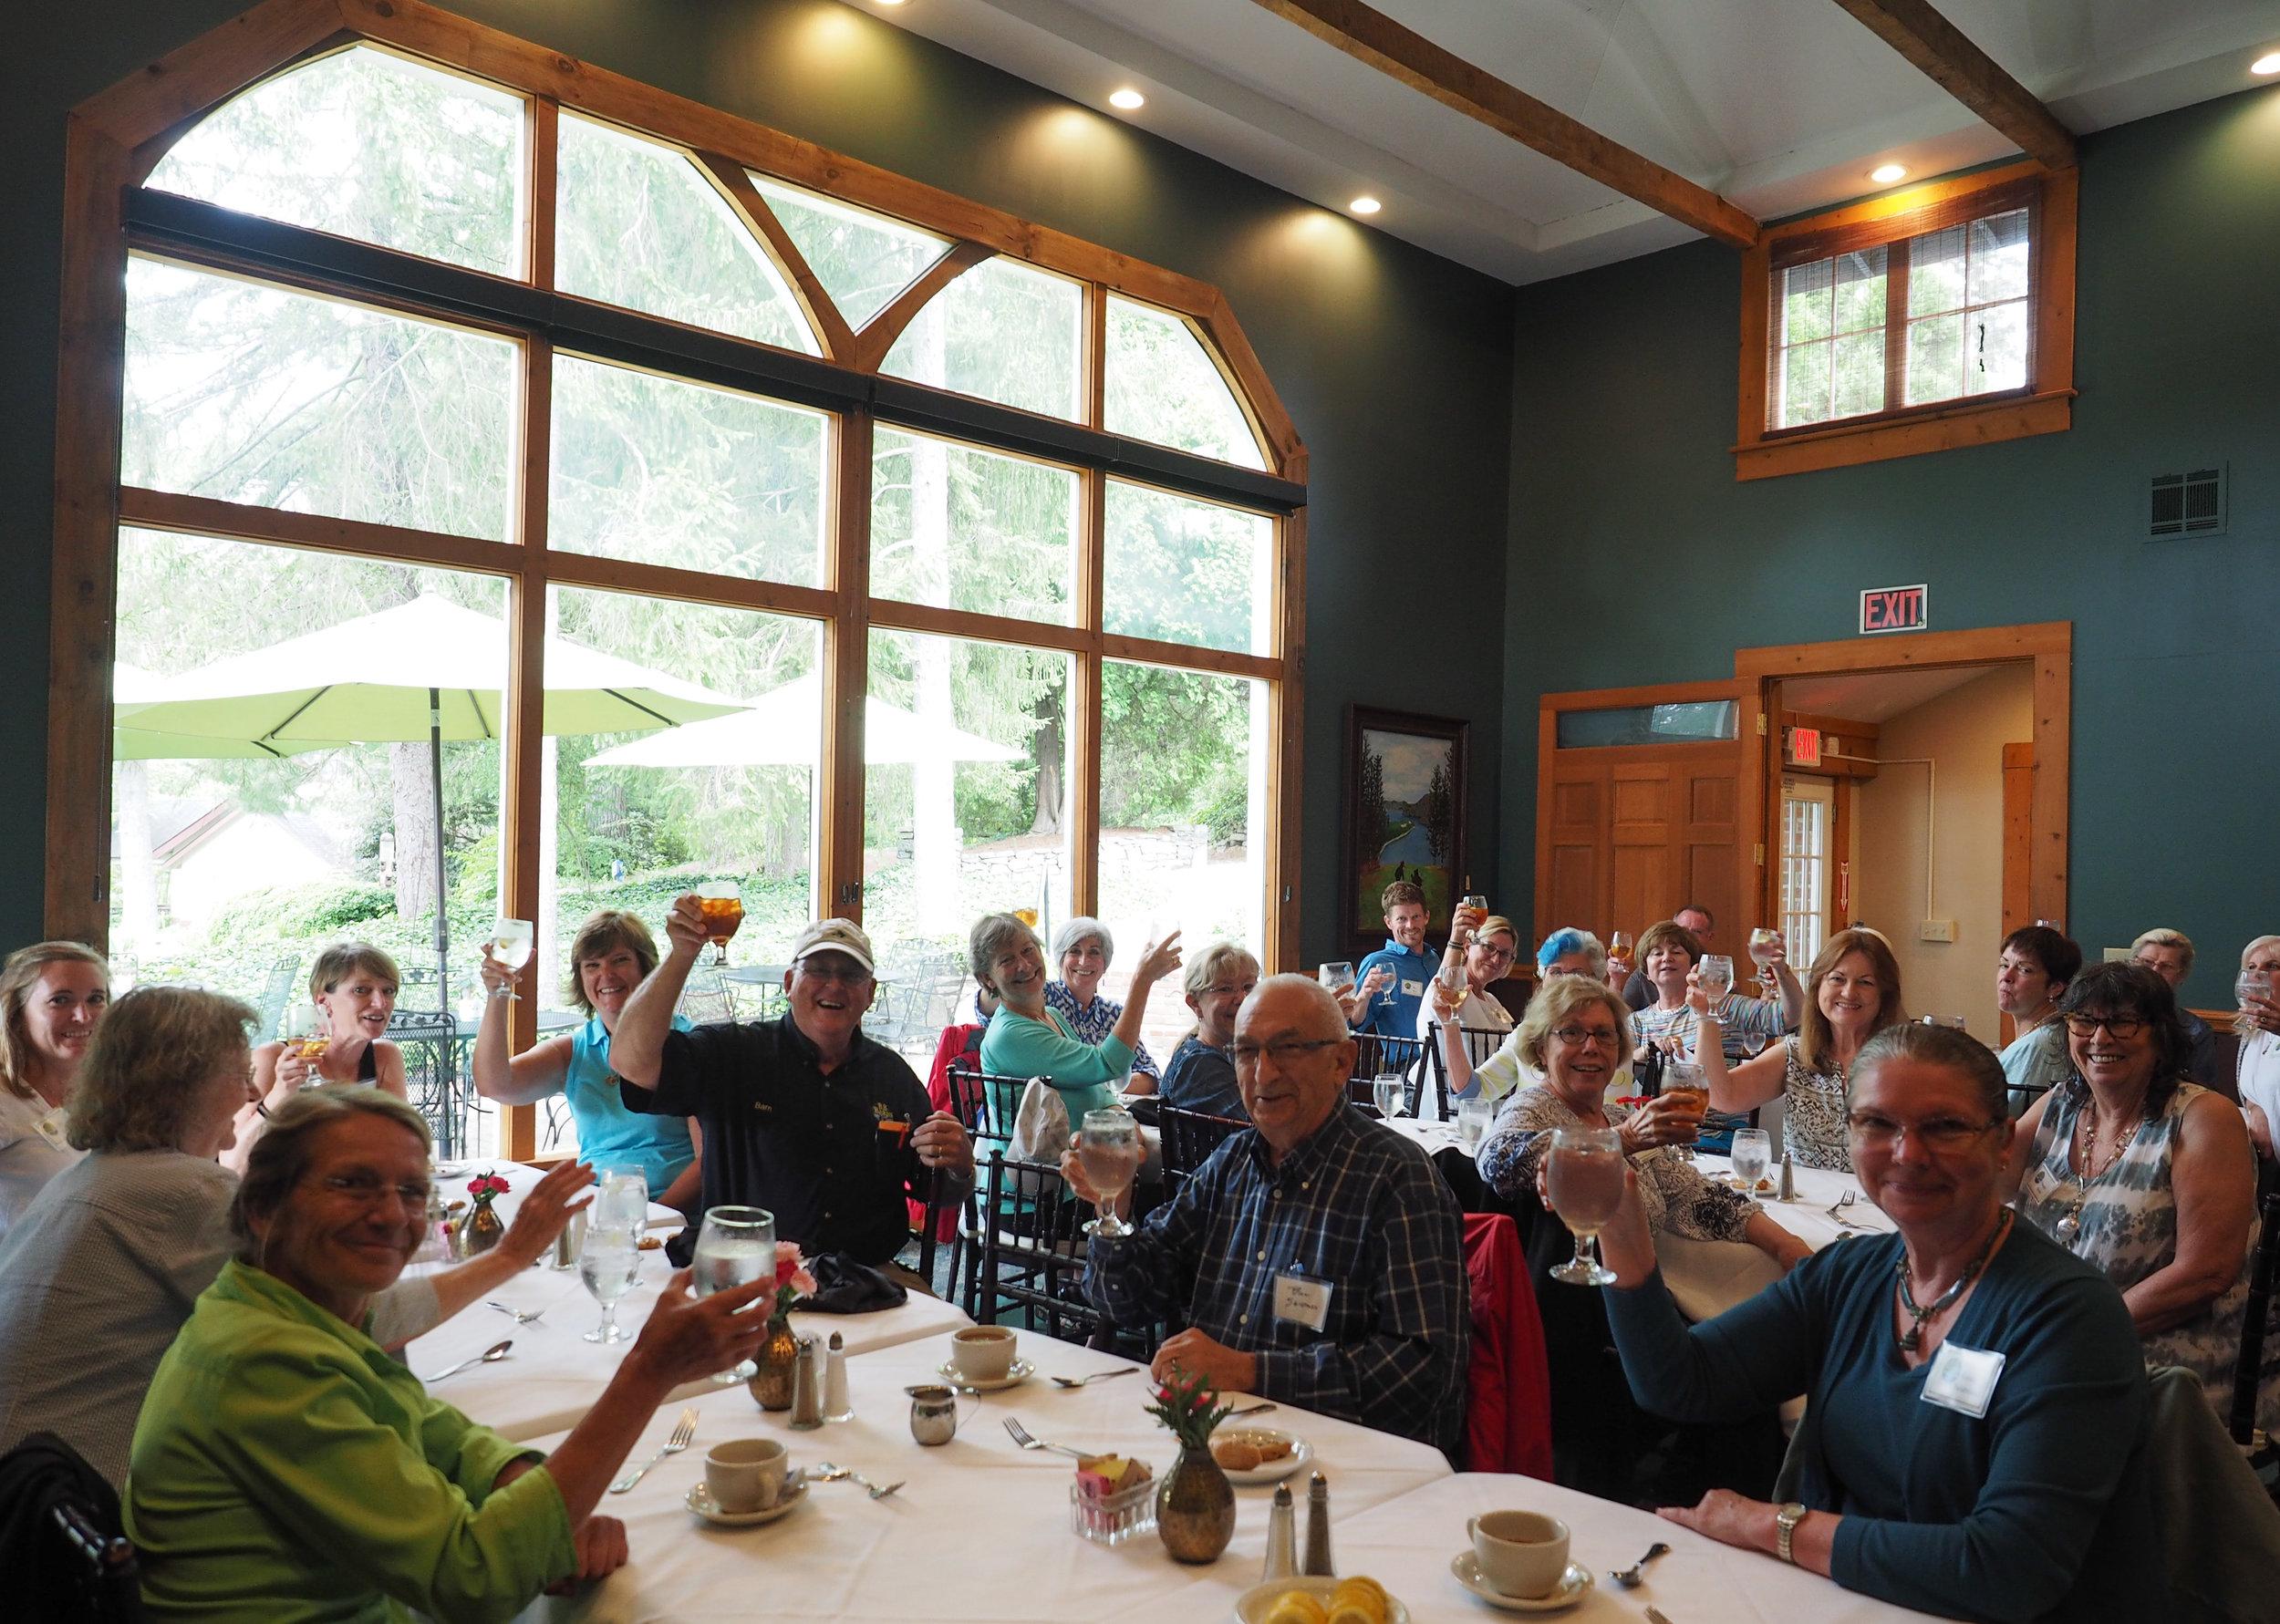 Lunch at Highland Lake Inn.